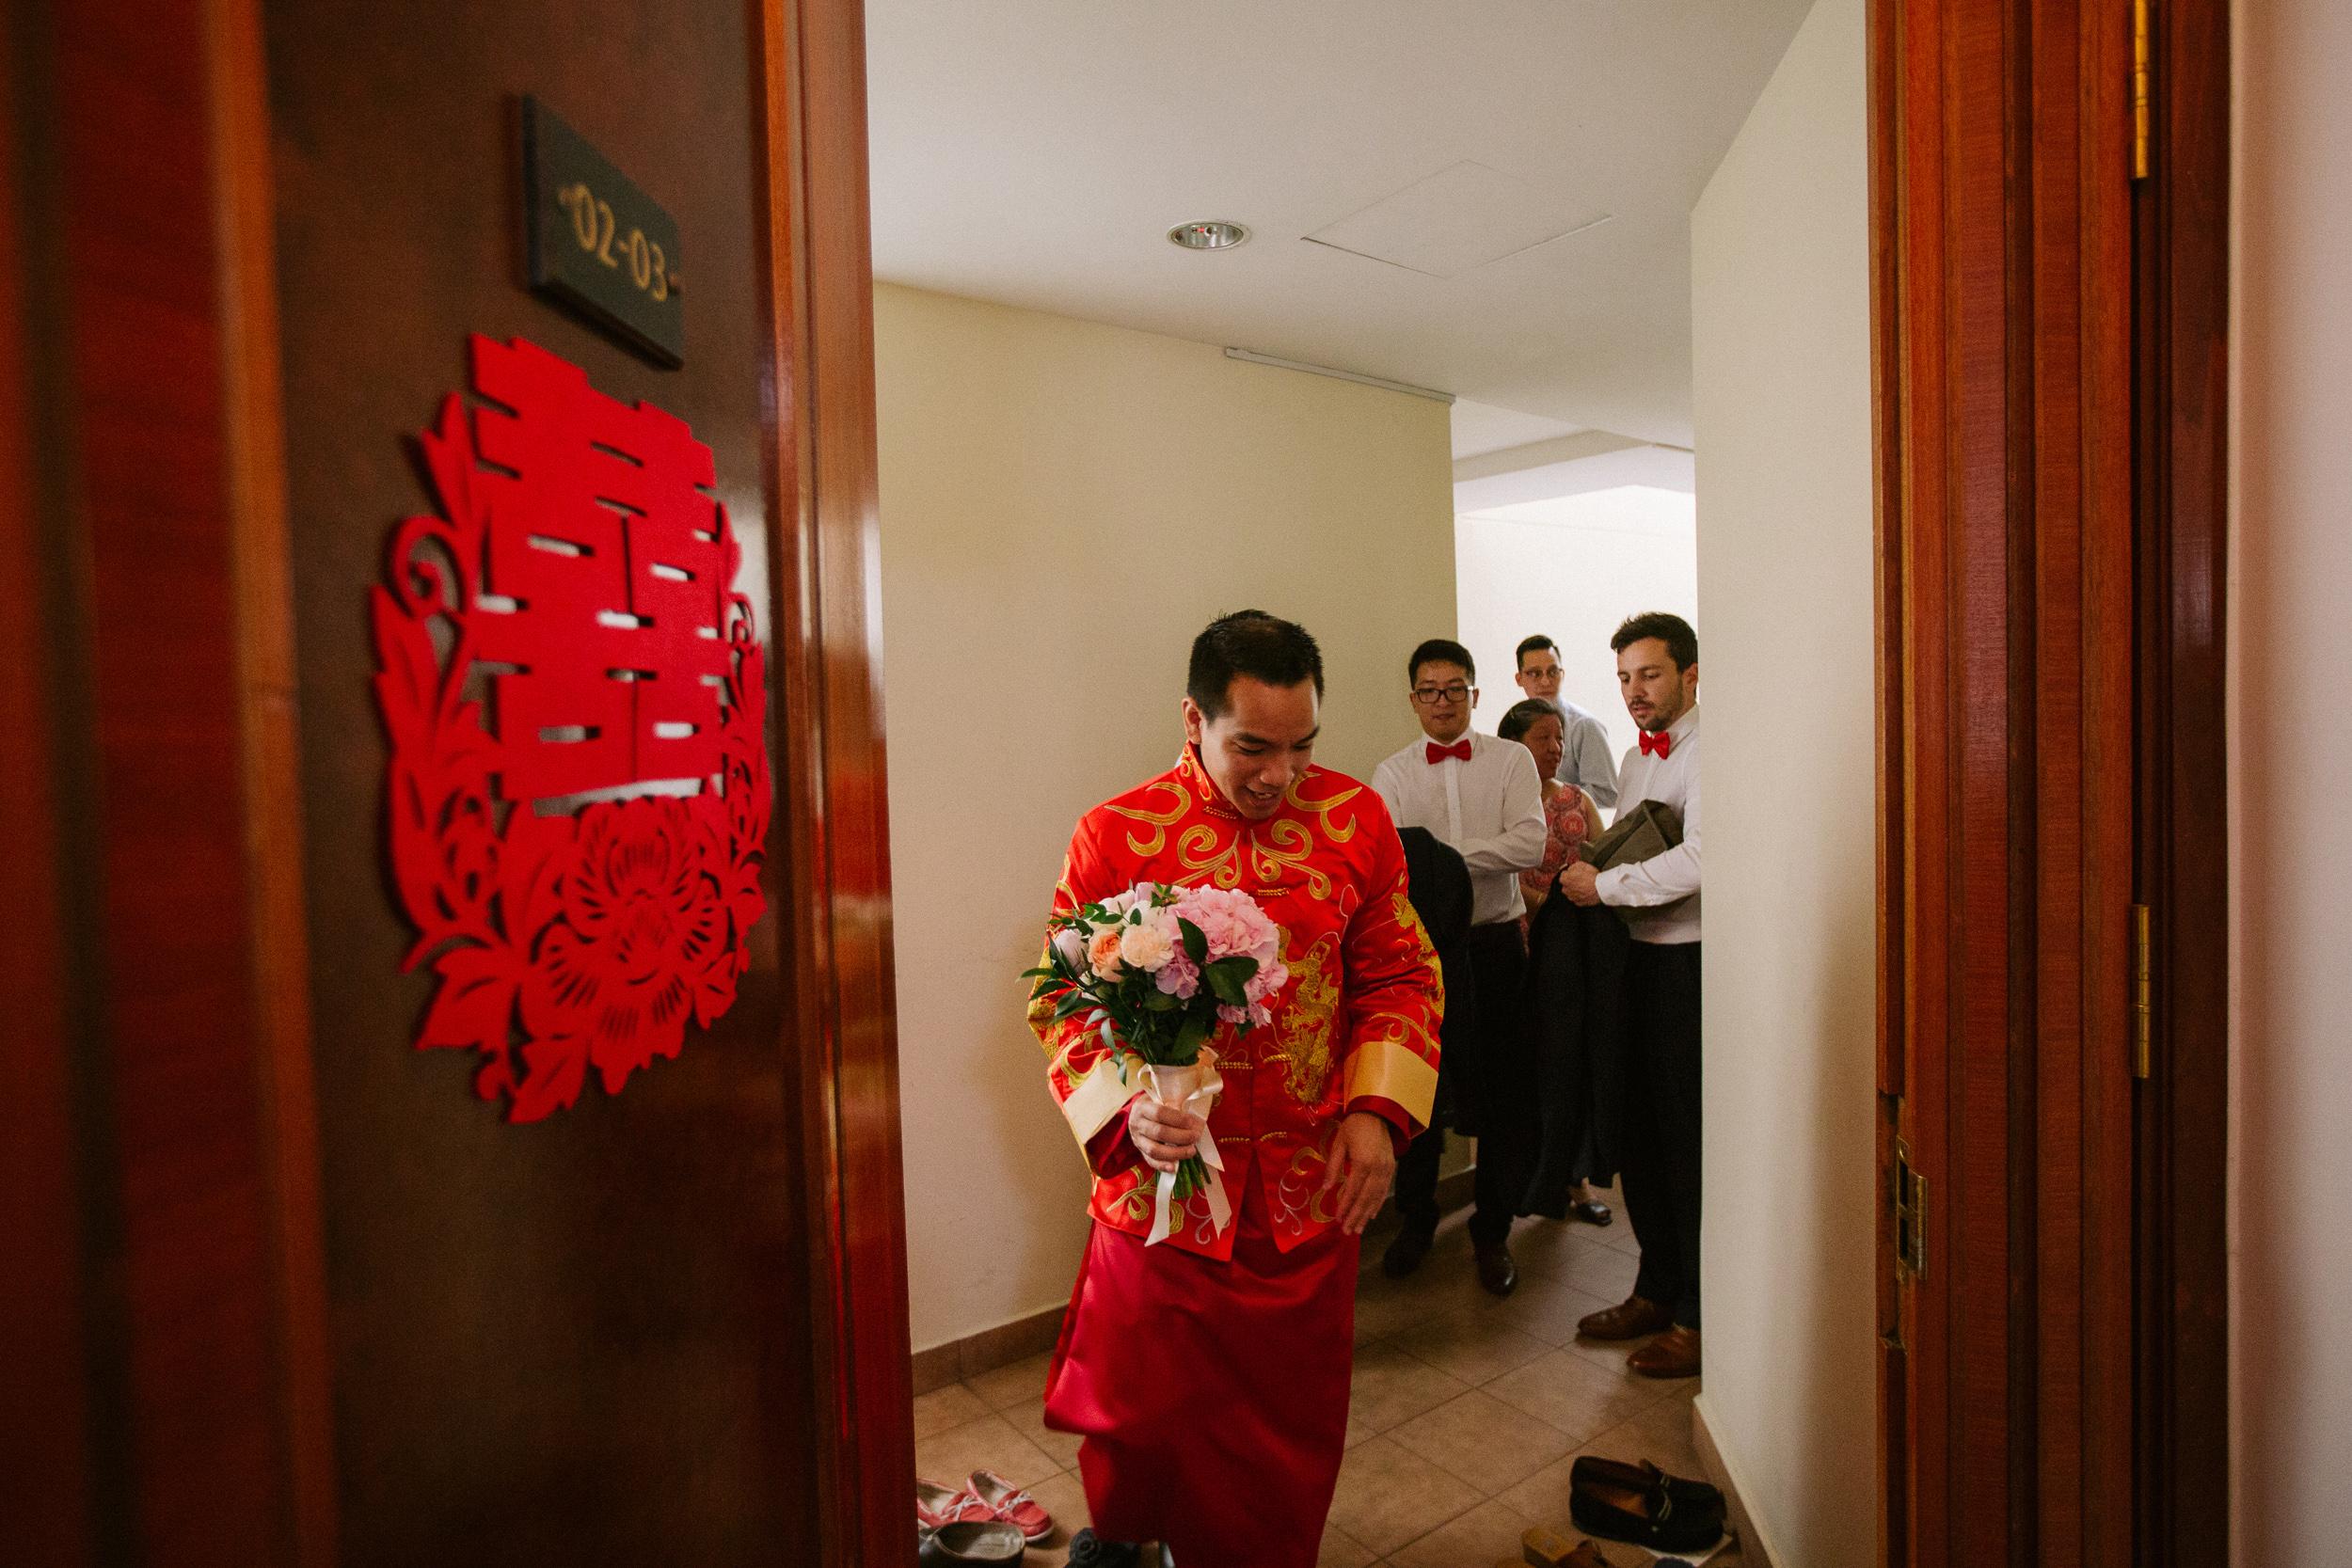 singapore-wedding-photographer-cheryl-matthew-fullerton-hotel-wedding-16.jpg